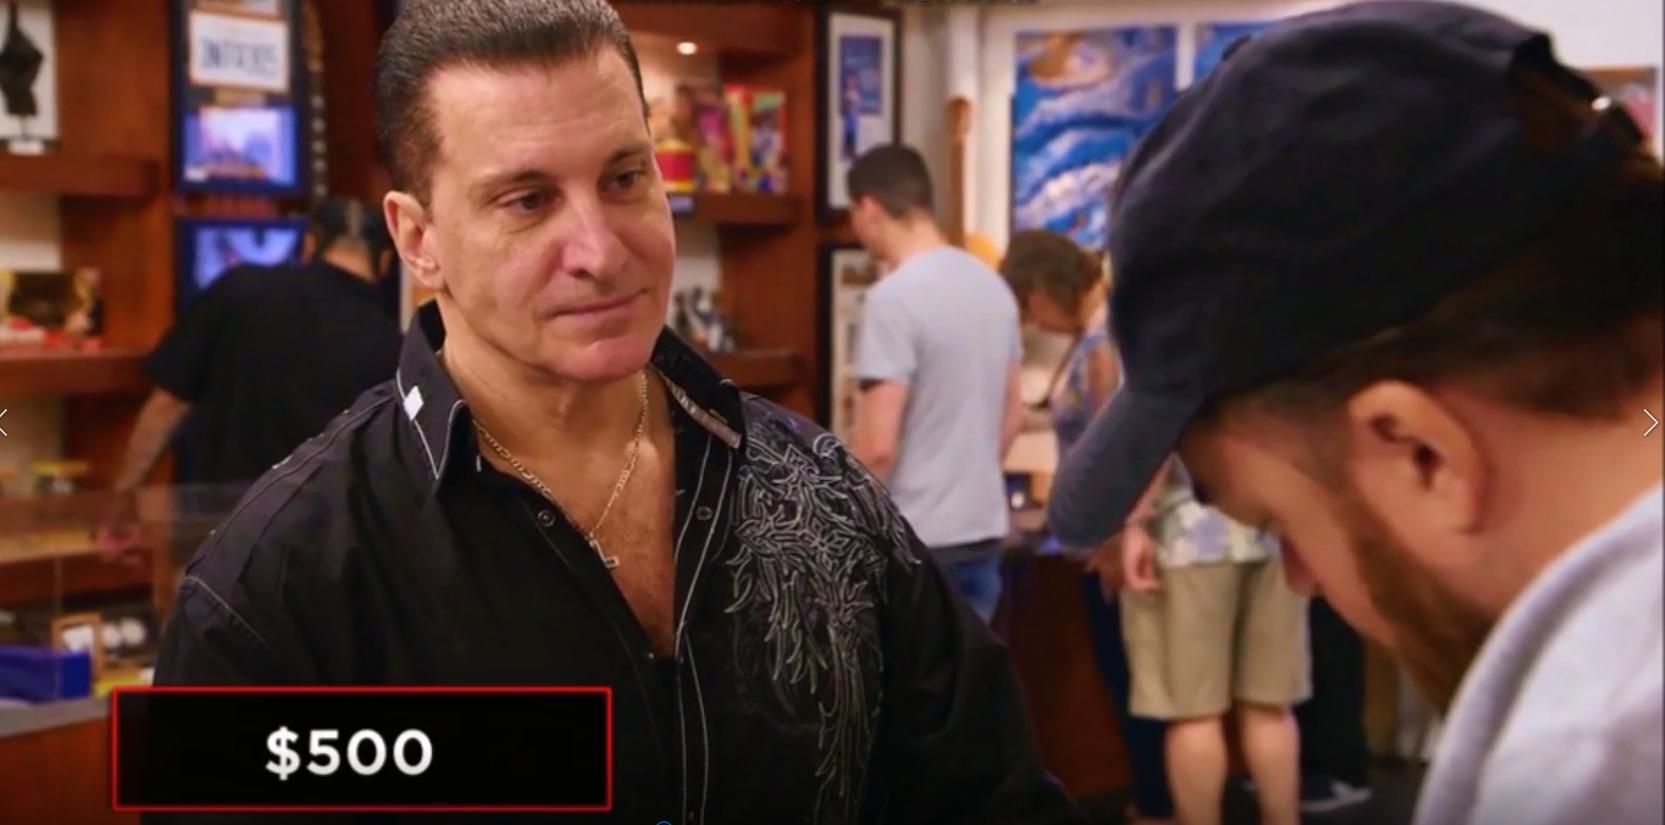 Pawn Stars New Season With James J Zito III